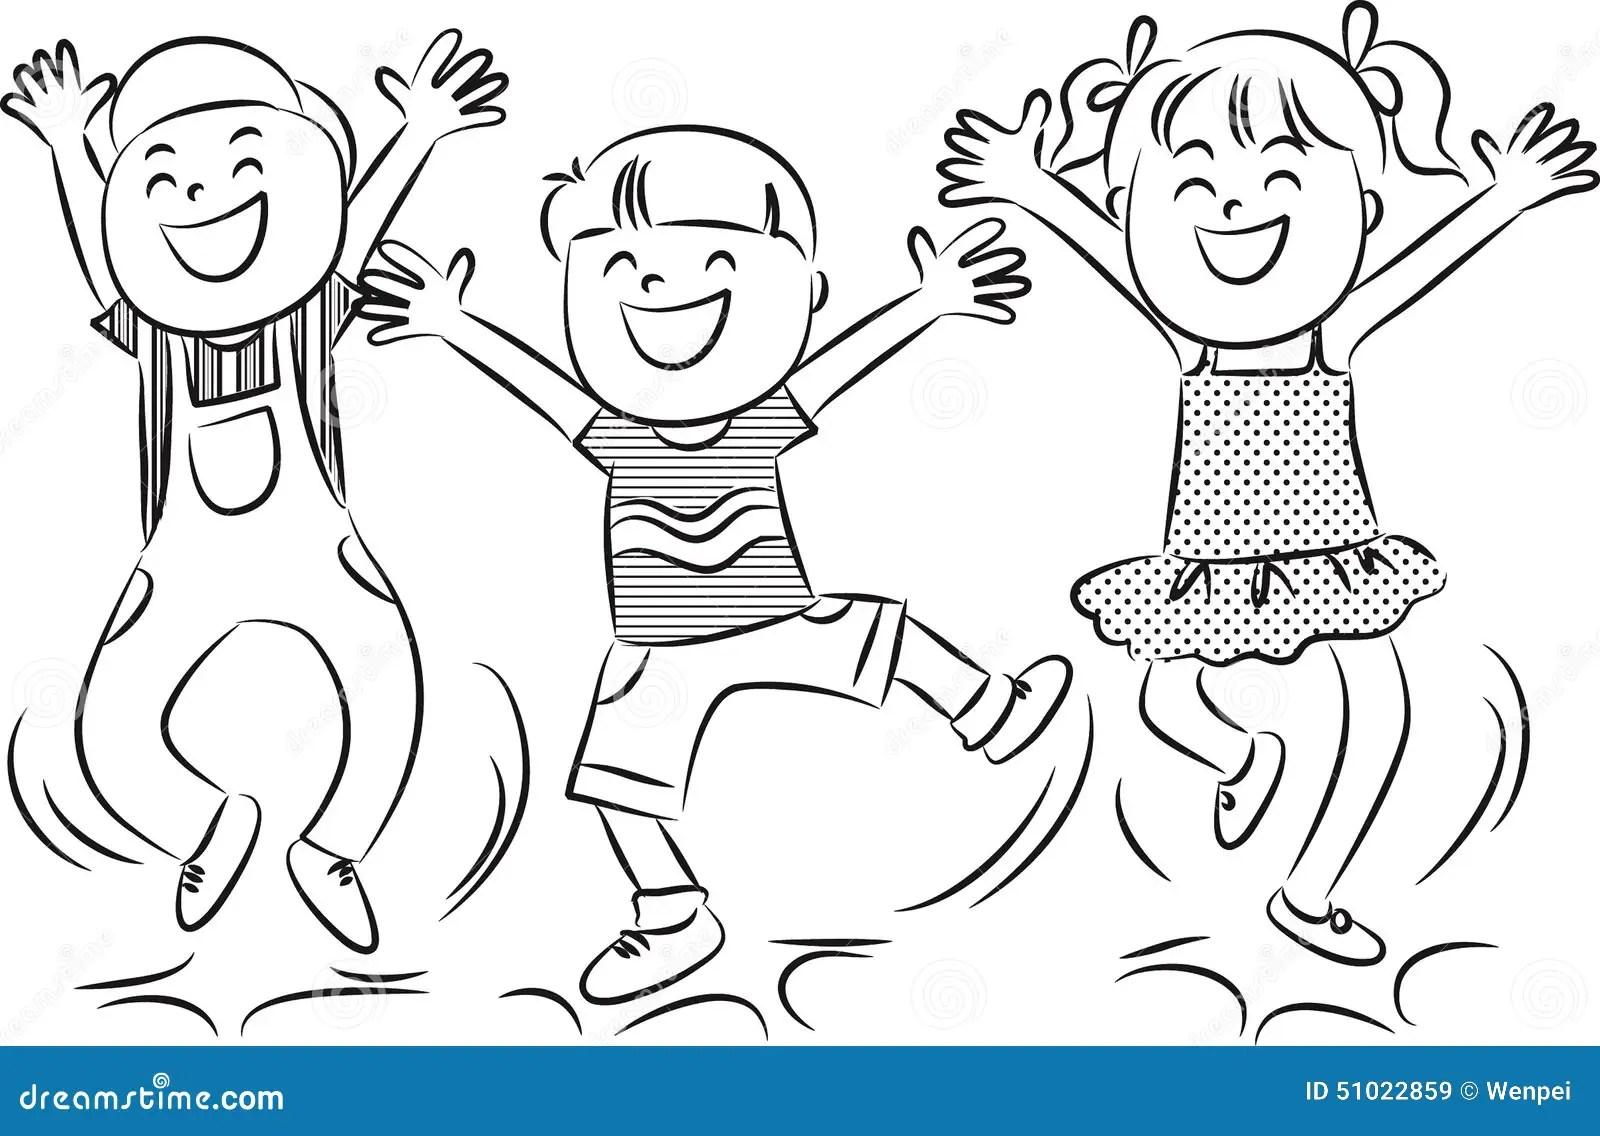 Cartoon Happy Jumping Kids